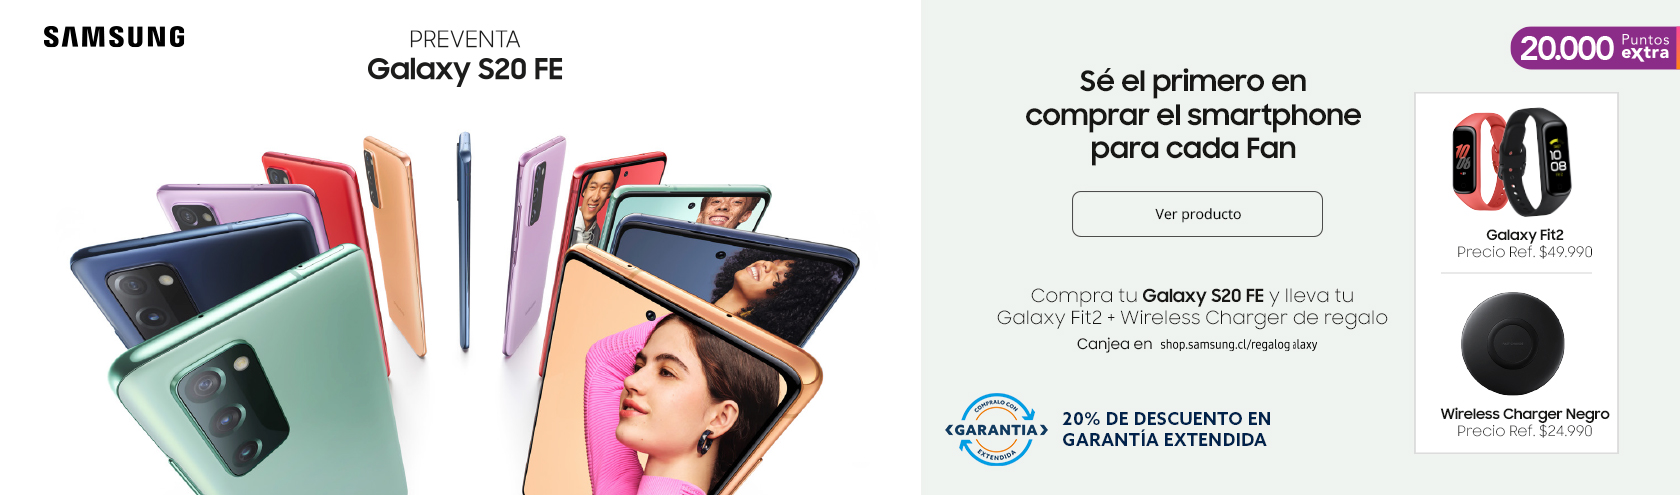 Preventa Samsung Galaxy S20 FE